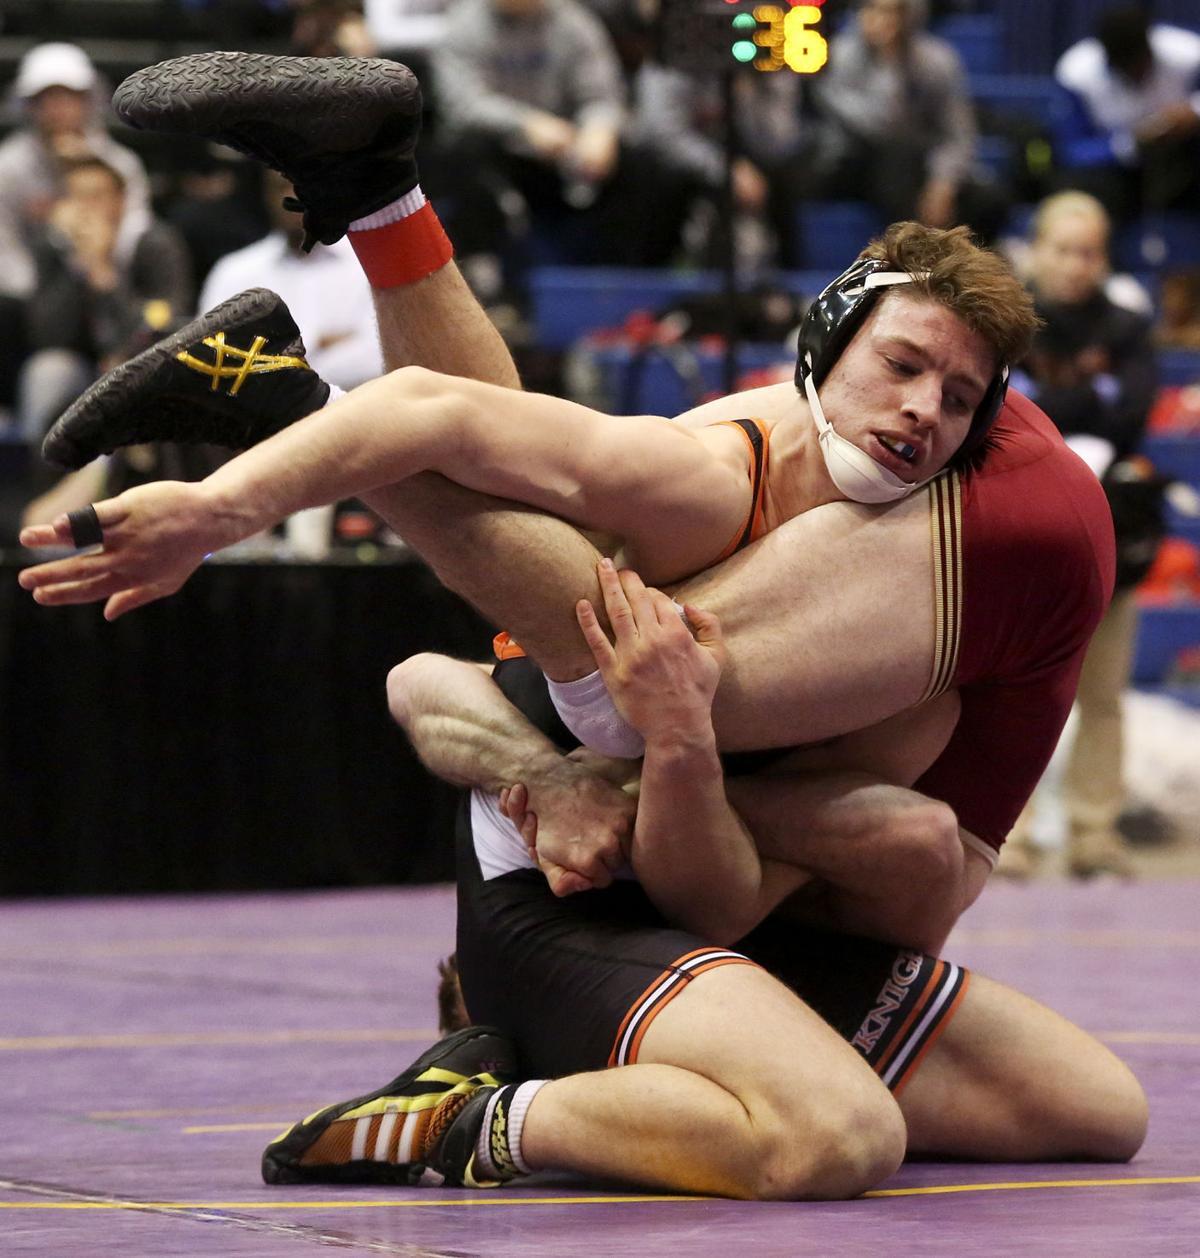 NCAA DIII Lower Midwest Regional Wrestling tournament